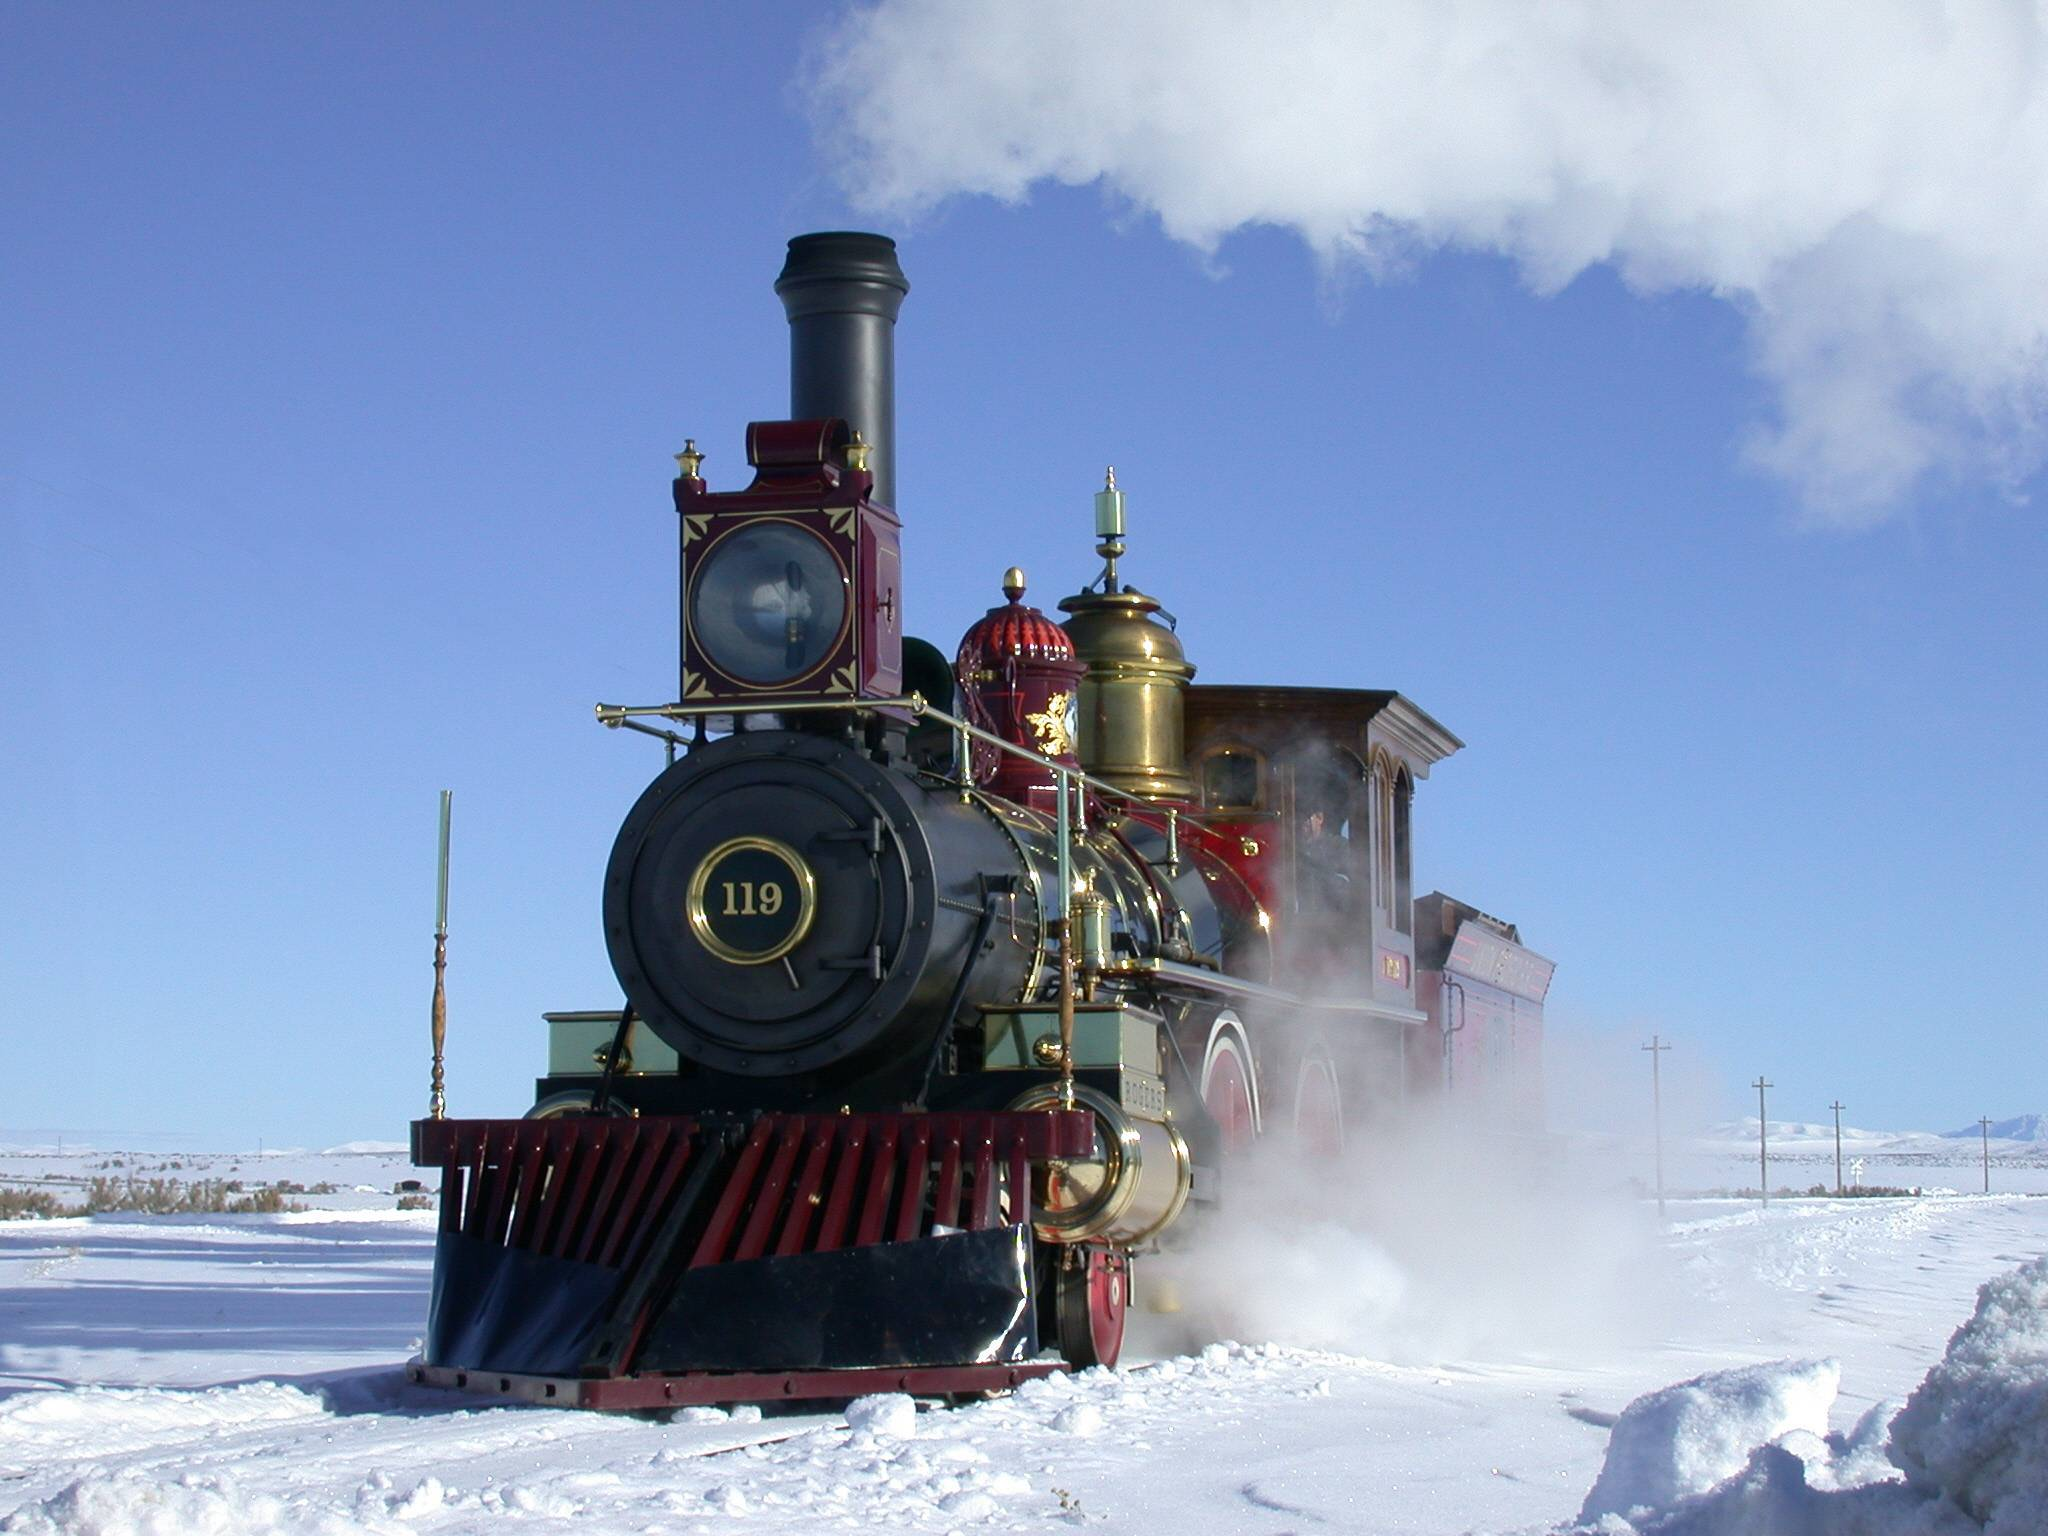 No. 119 in snow